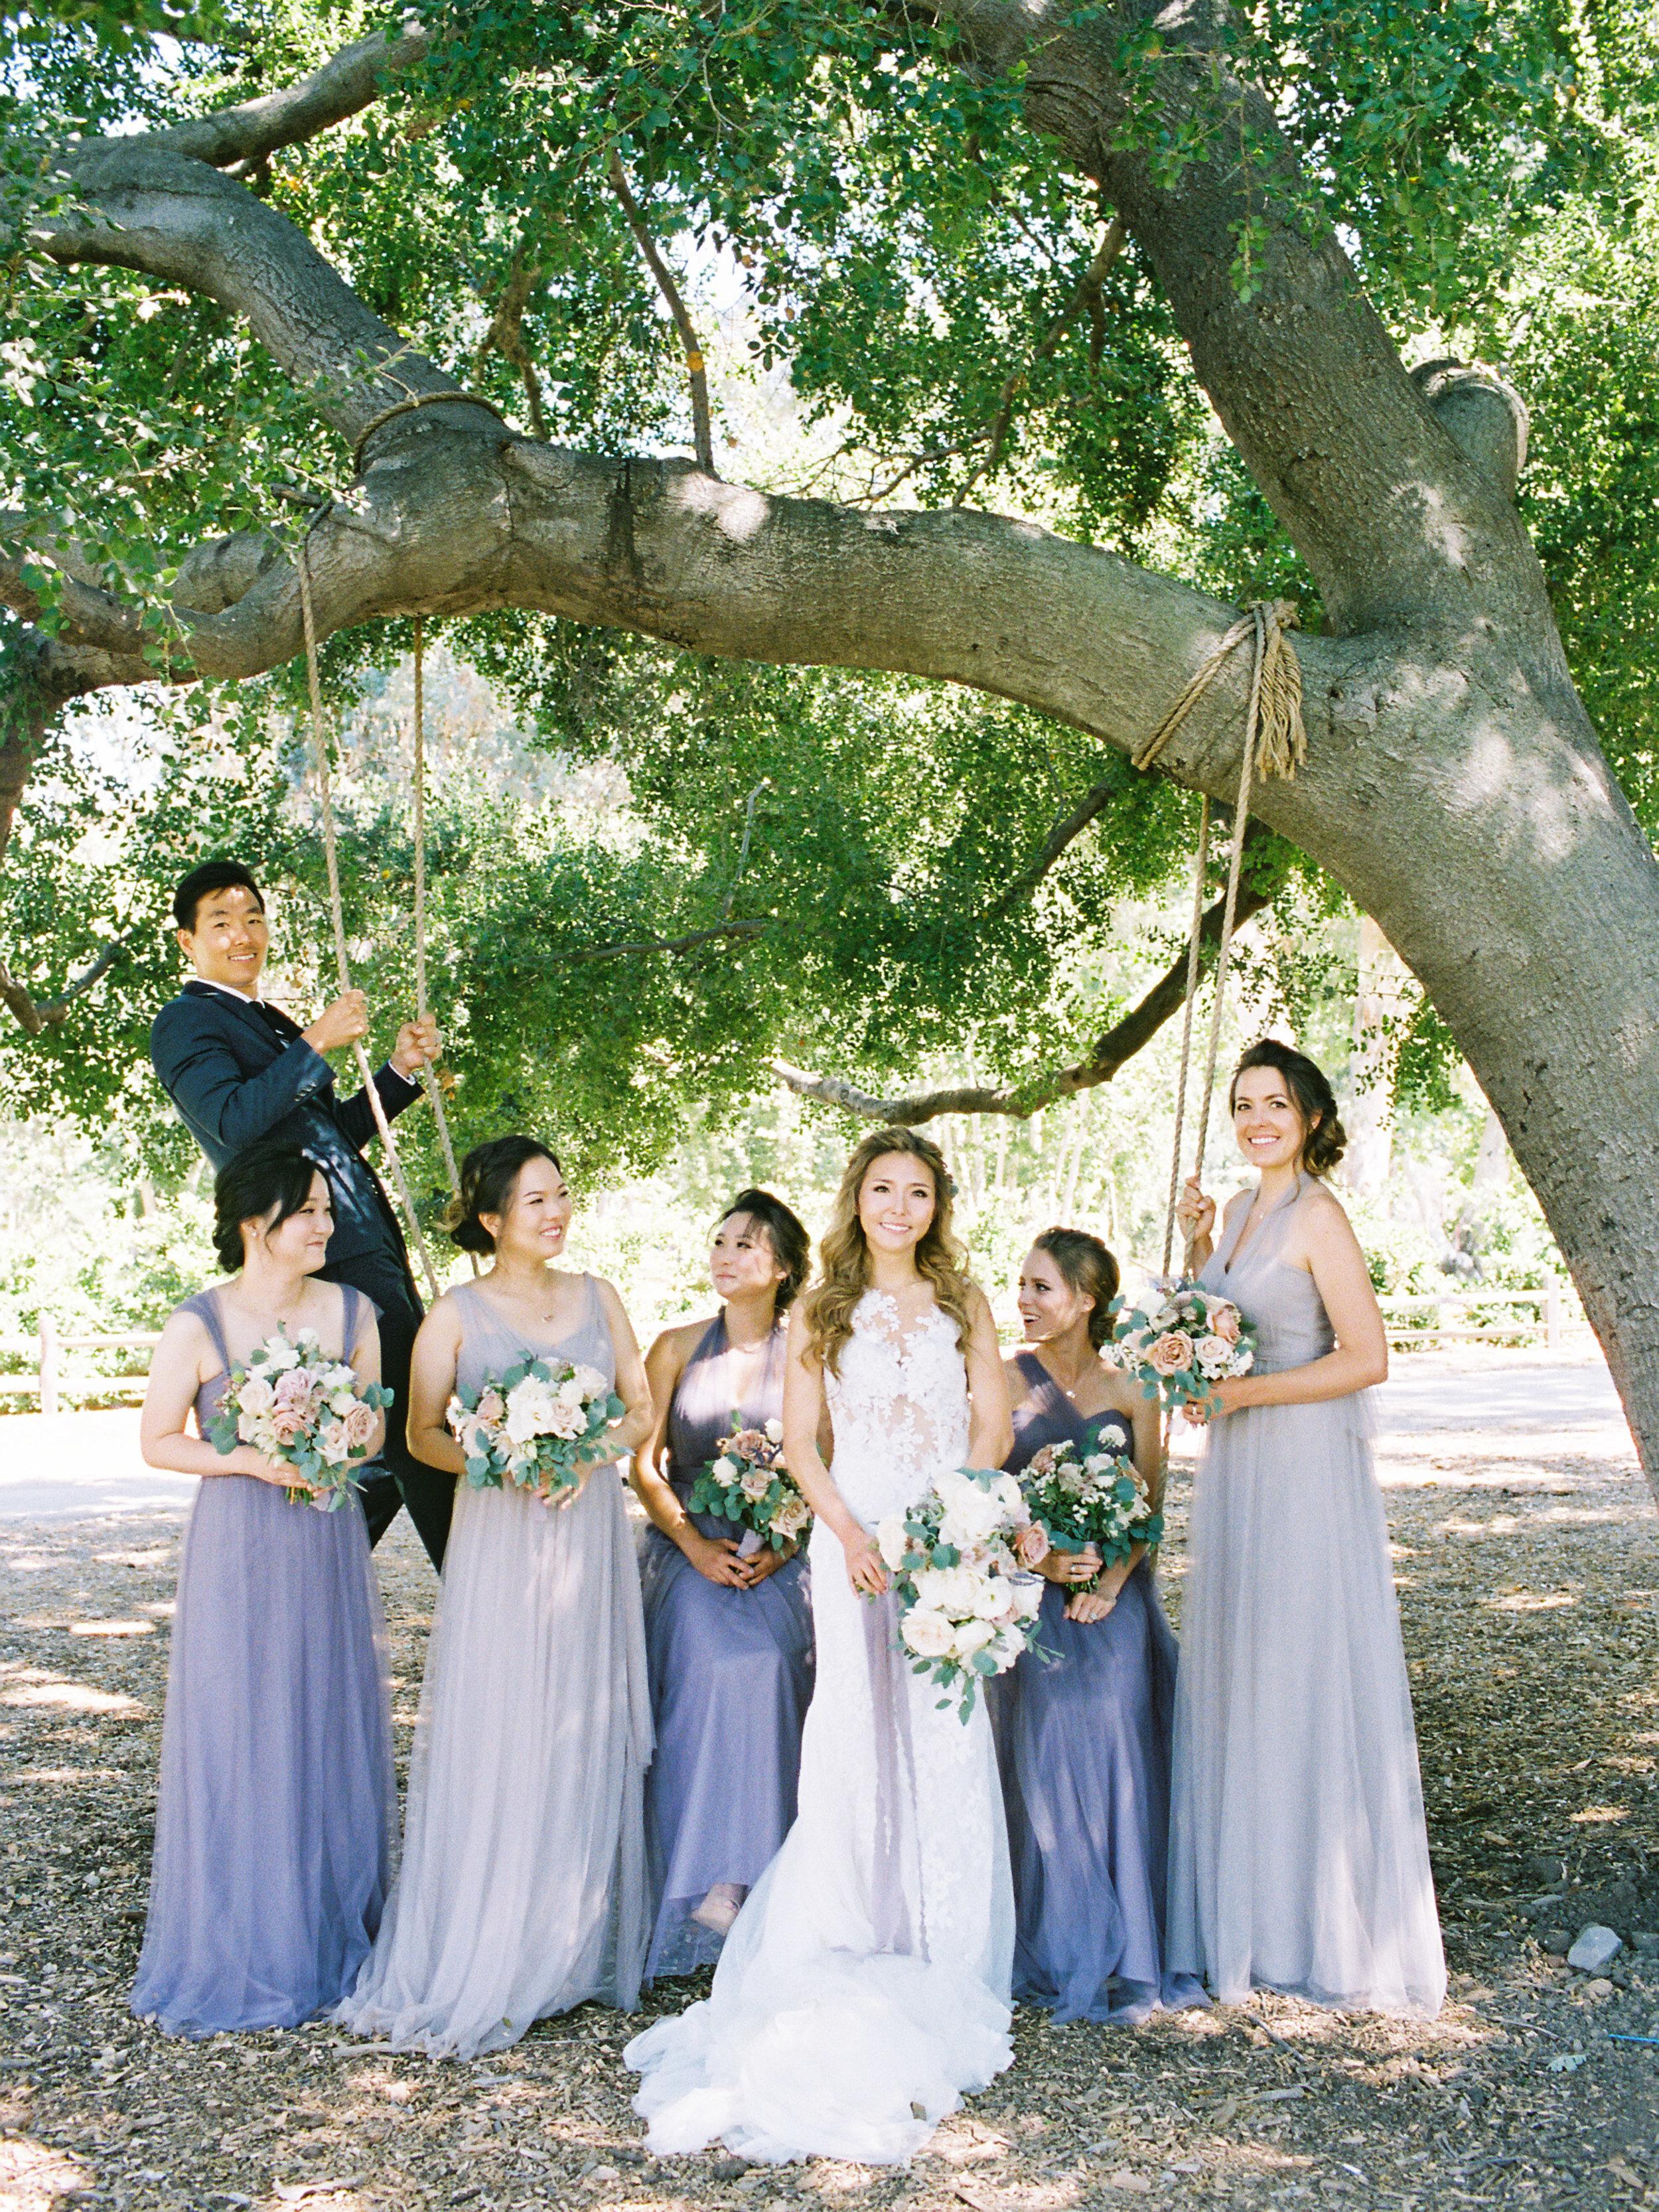 Triunfo_Creek_Winery_Wedding-132-Jen-Huang-JL-259-Jen-Huang-009961-R1-031.jpg